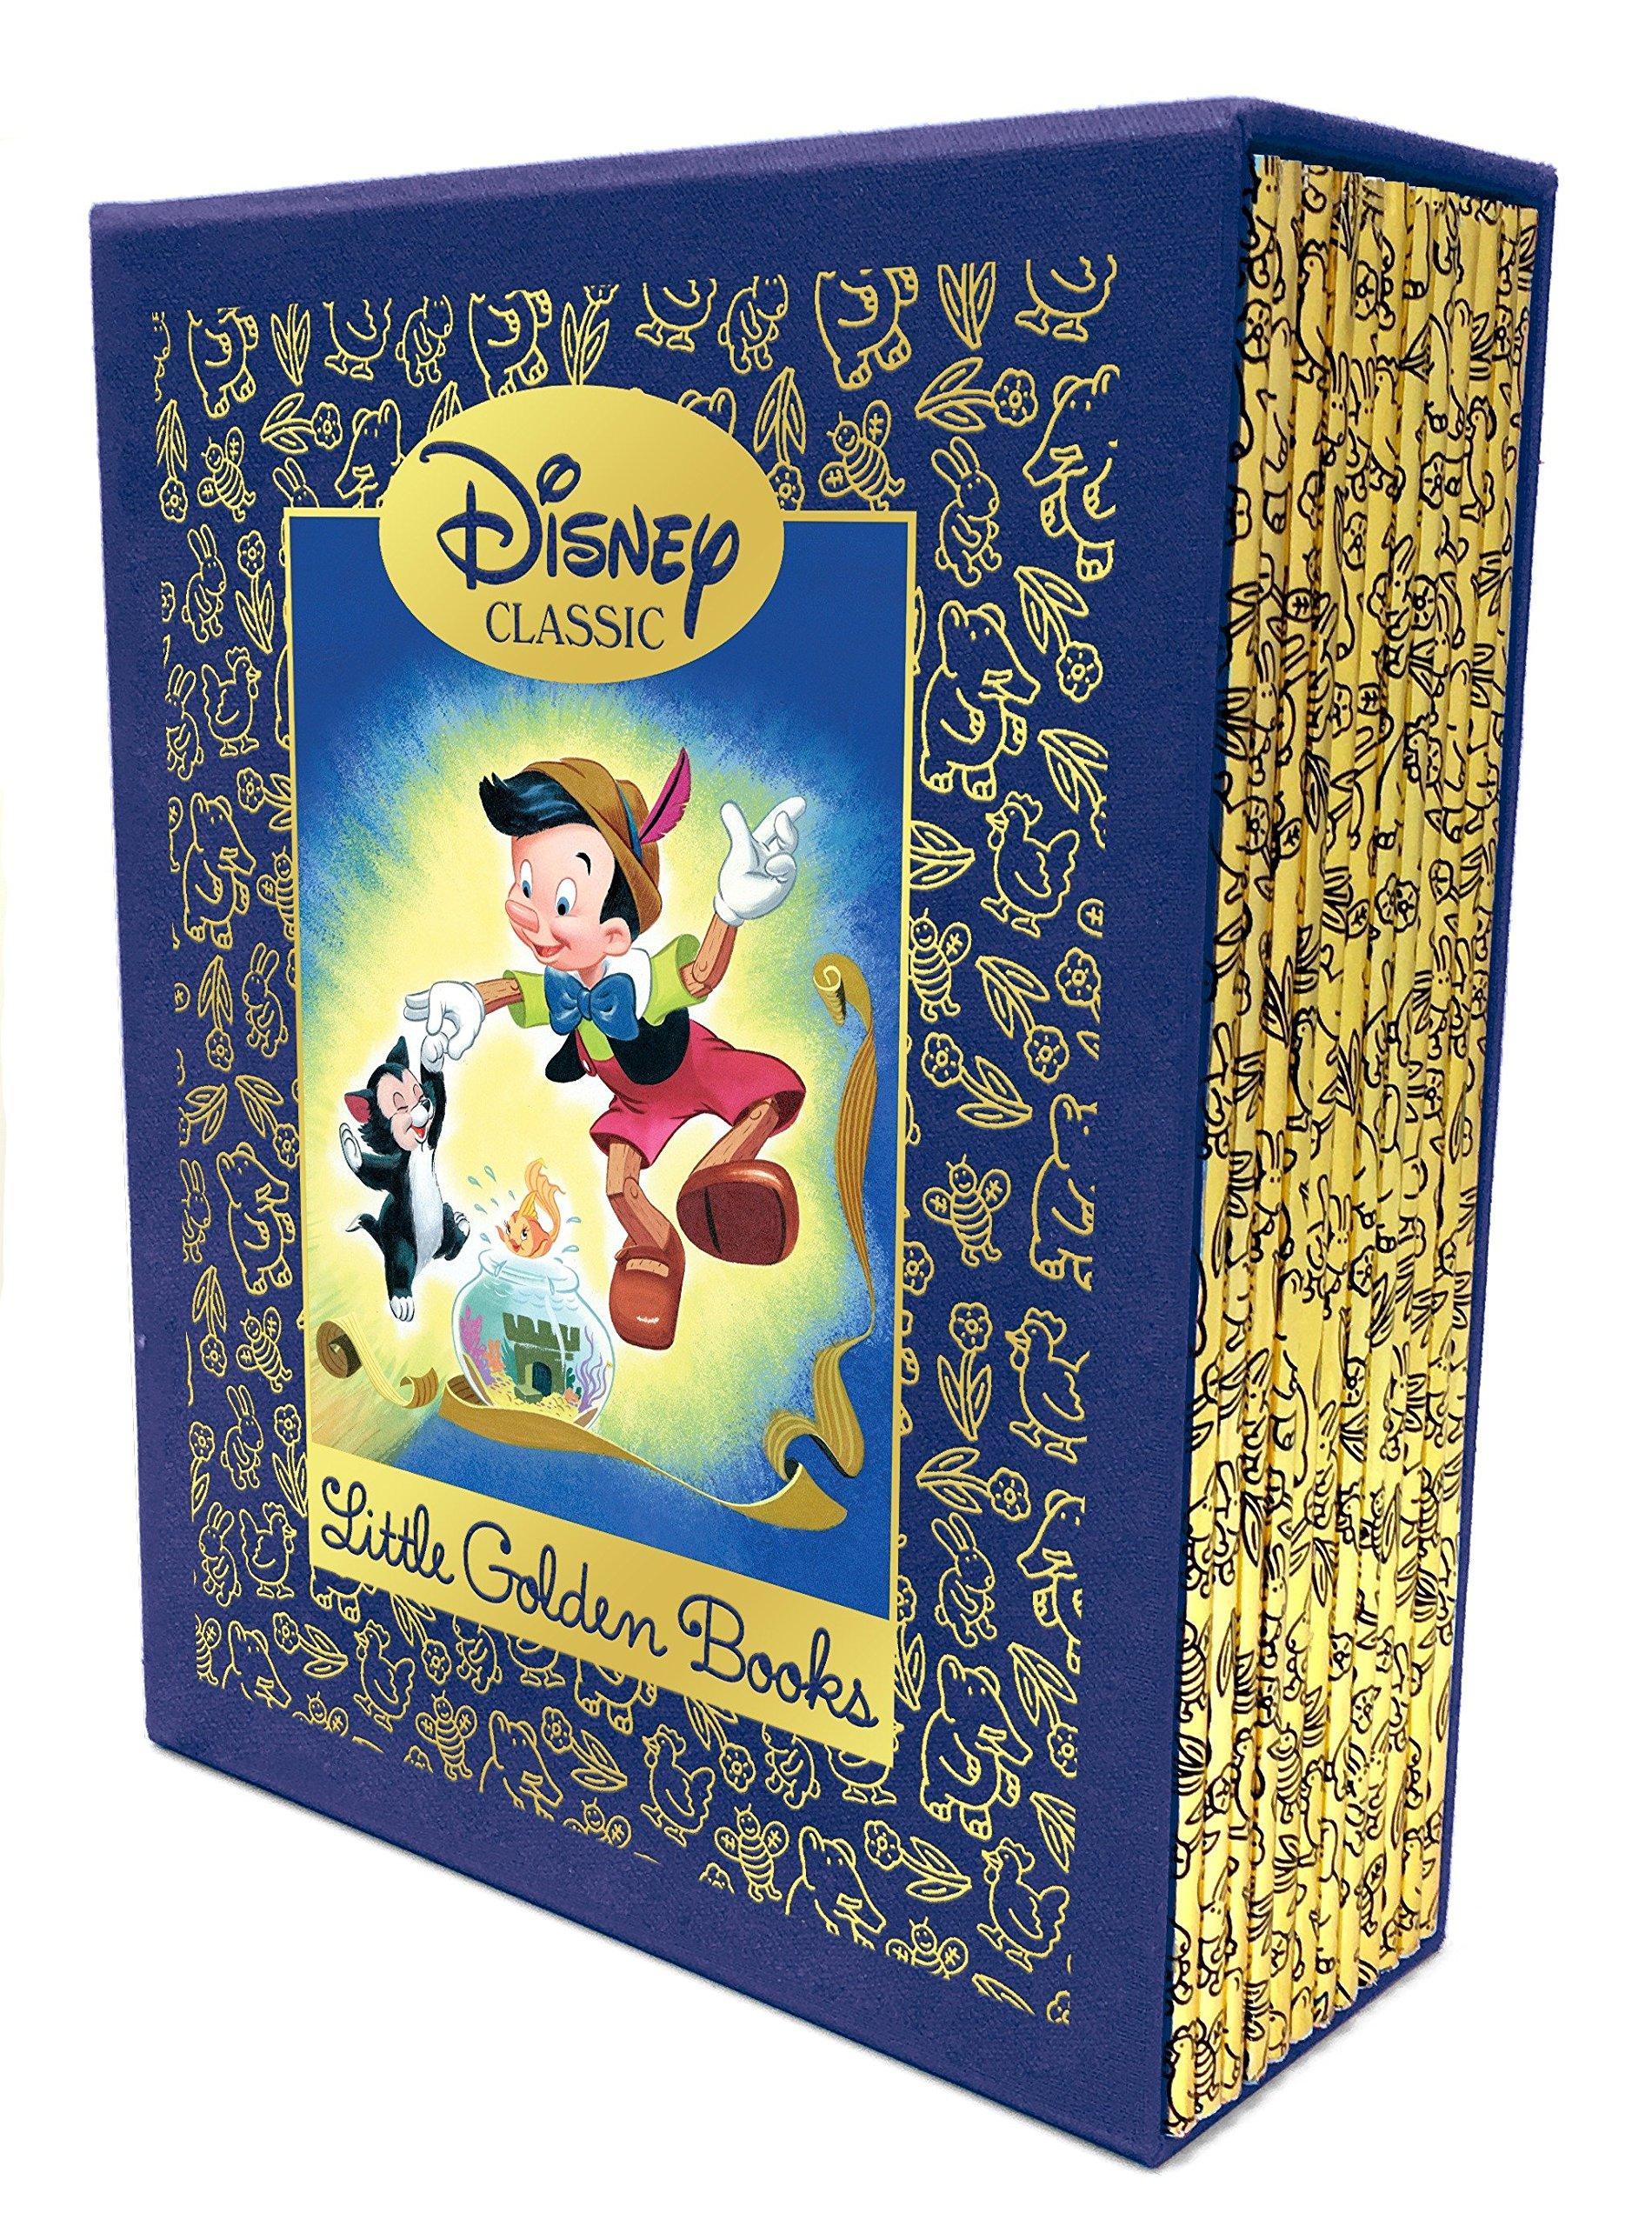 12 Beloved Disney Classic Little Golden Books (Disney Classic) by Golden/Disney